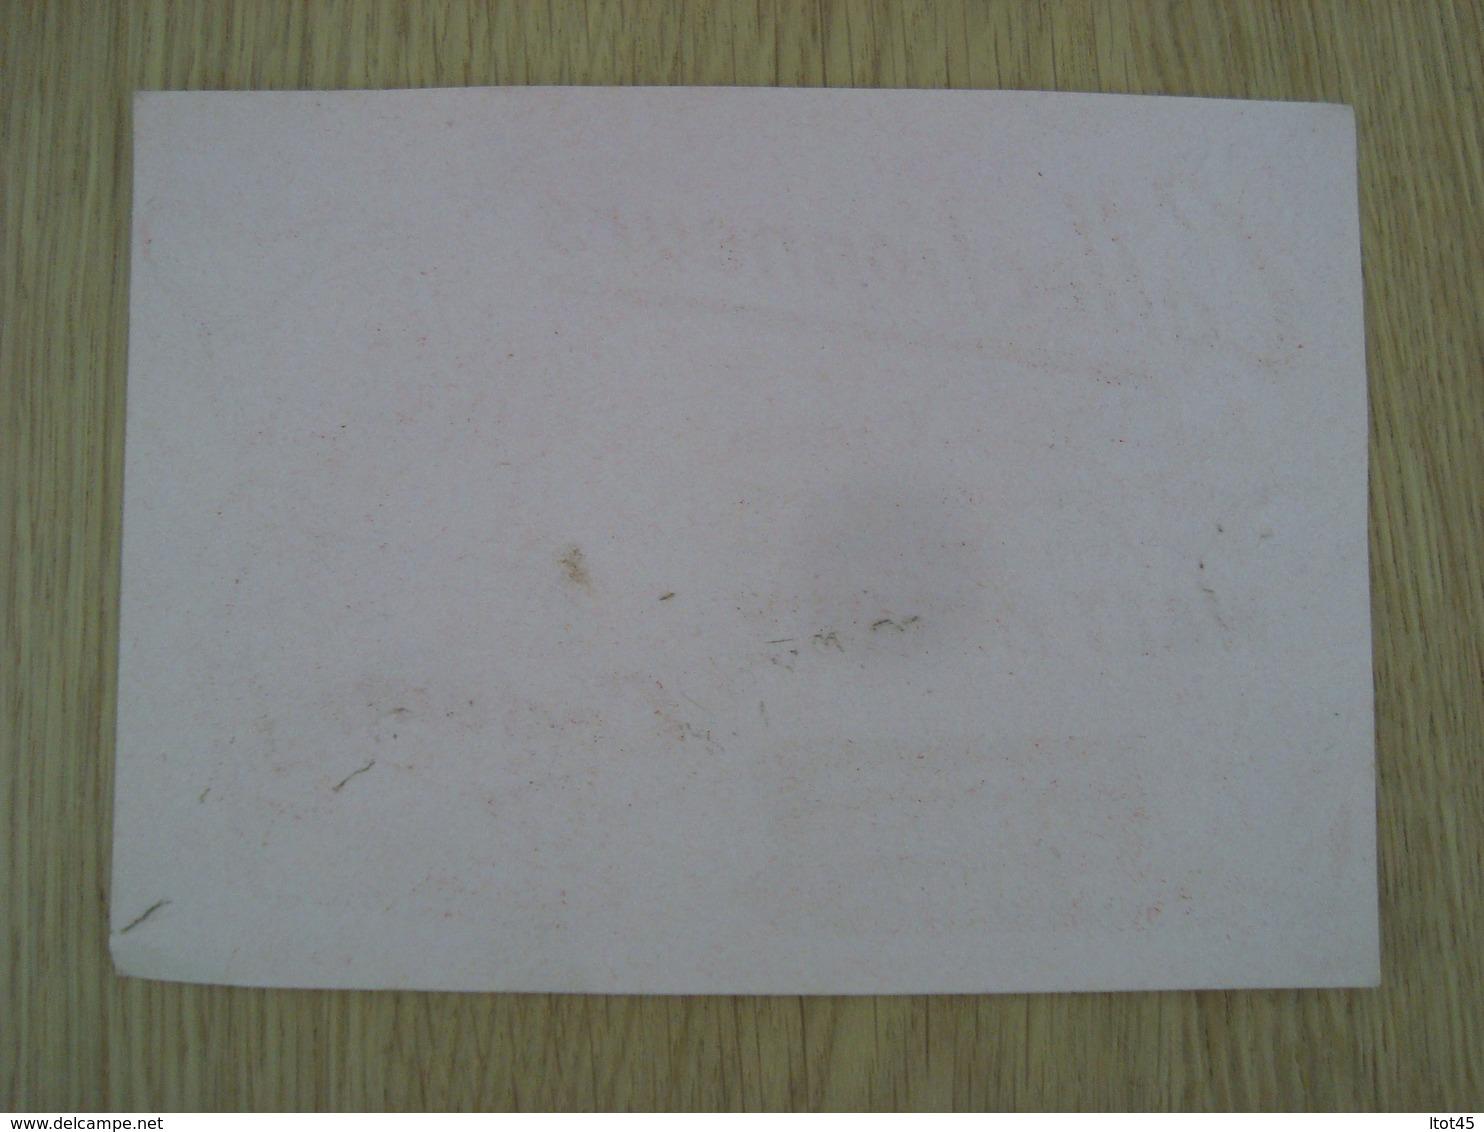 BUVARD SAVON CADUM WALT DISNEY - Buvards, Protège-cahiers Illustrés